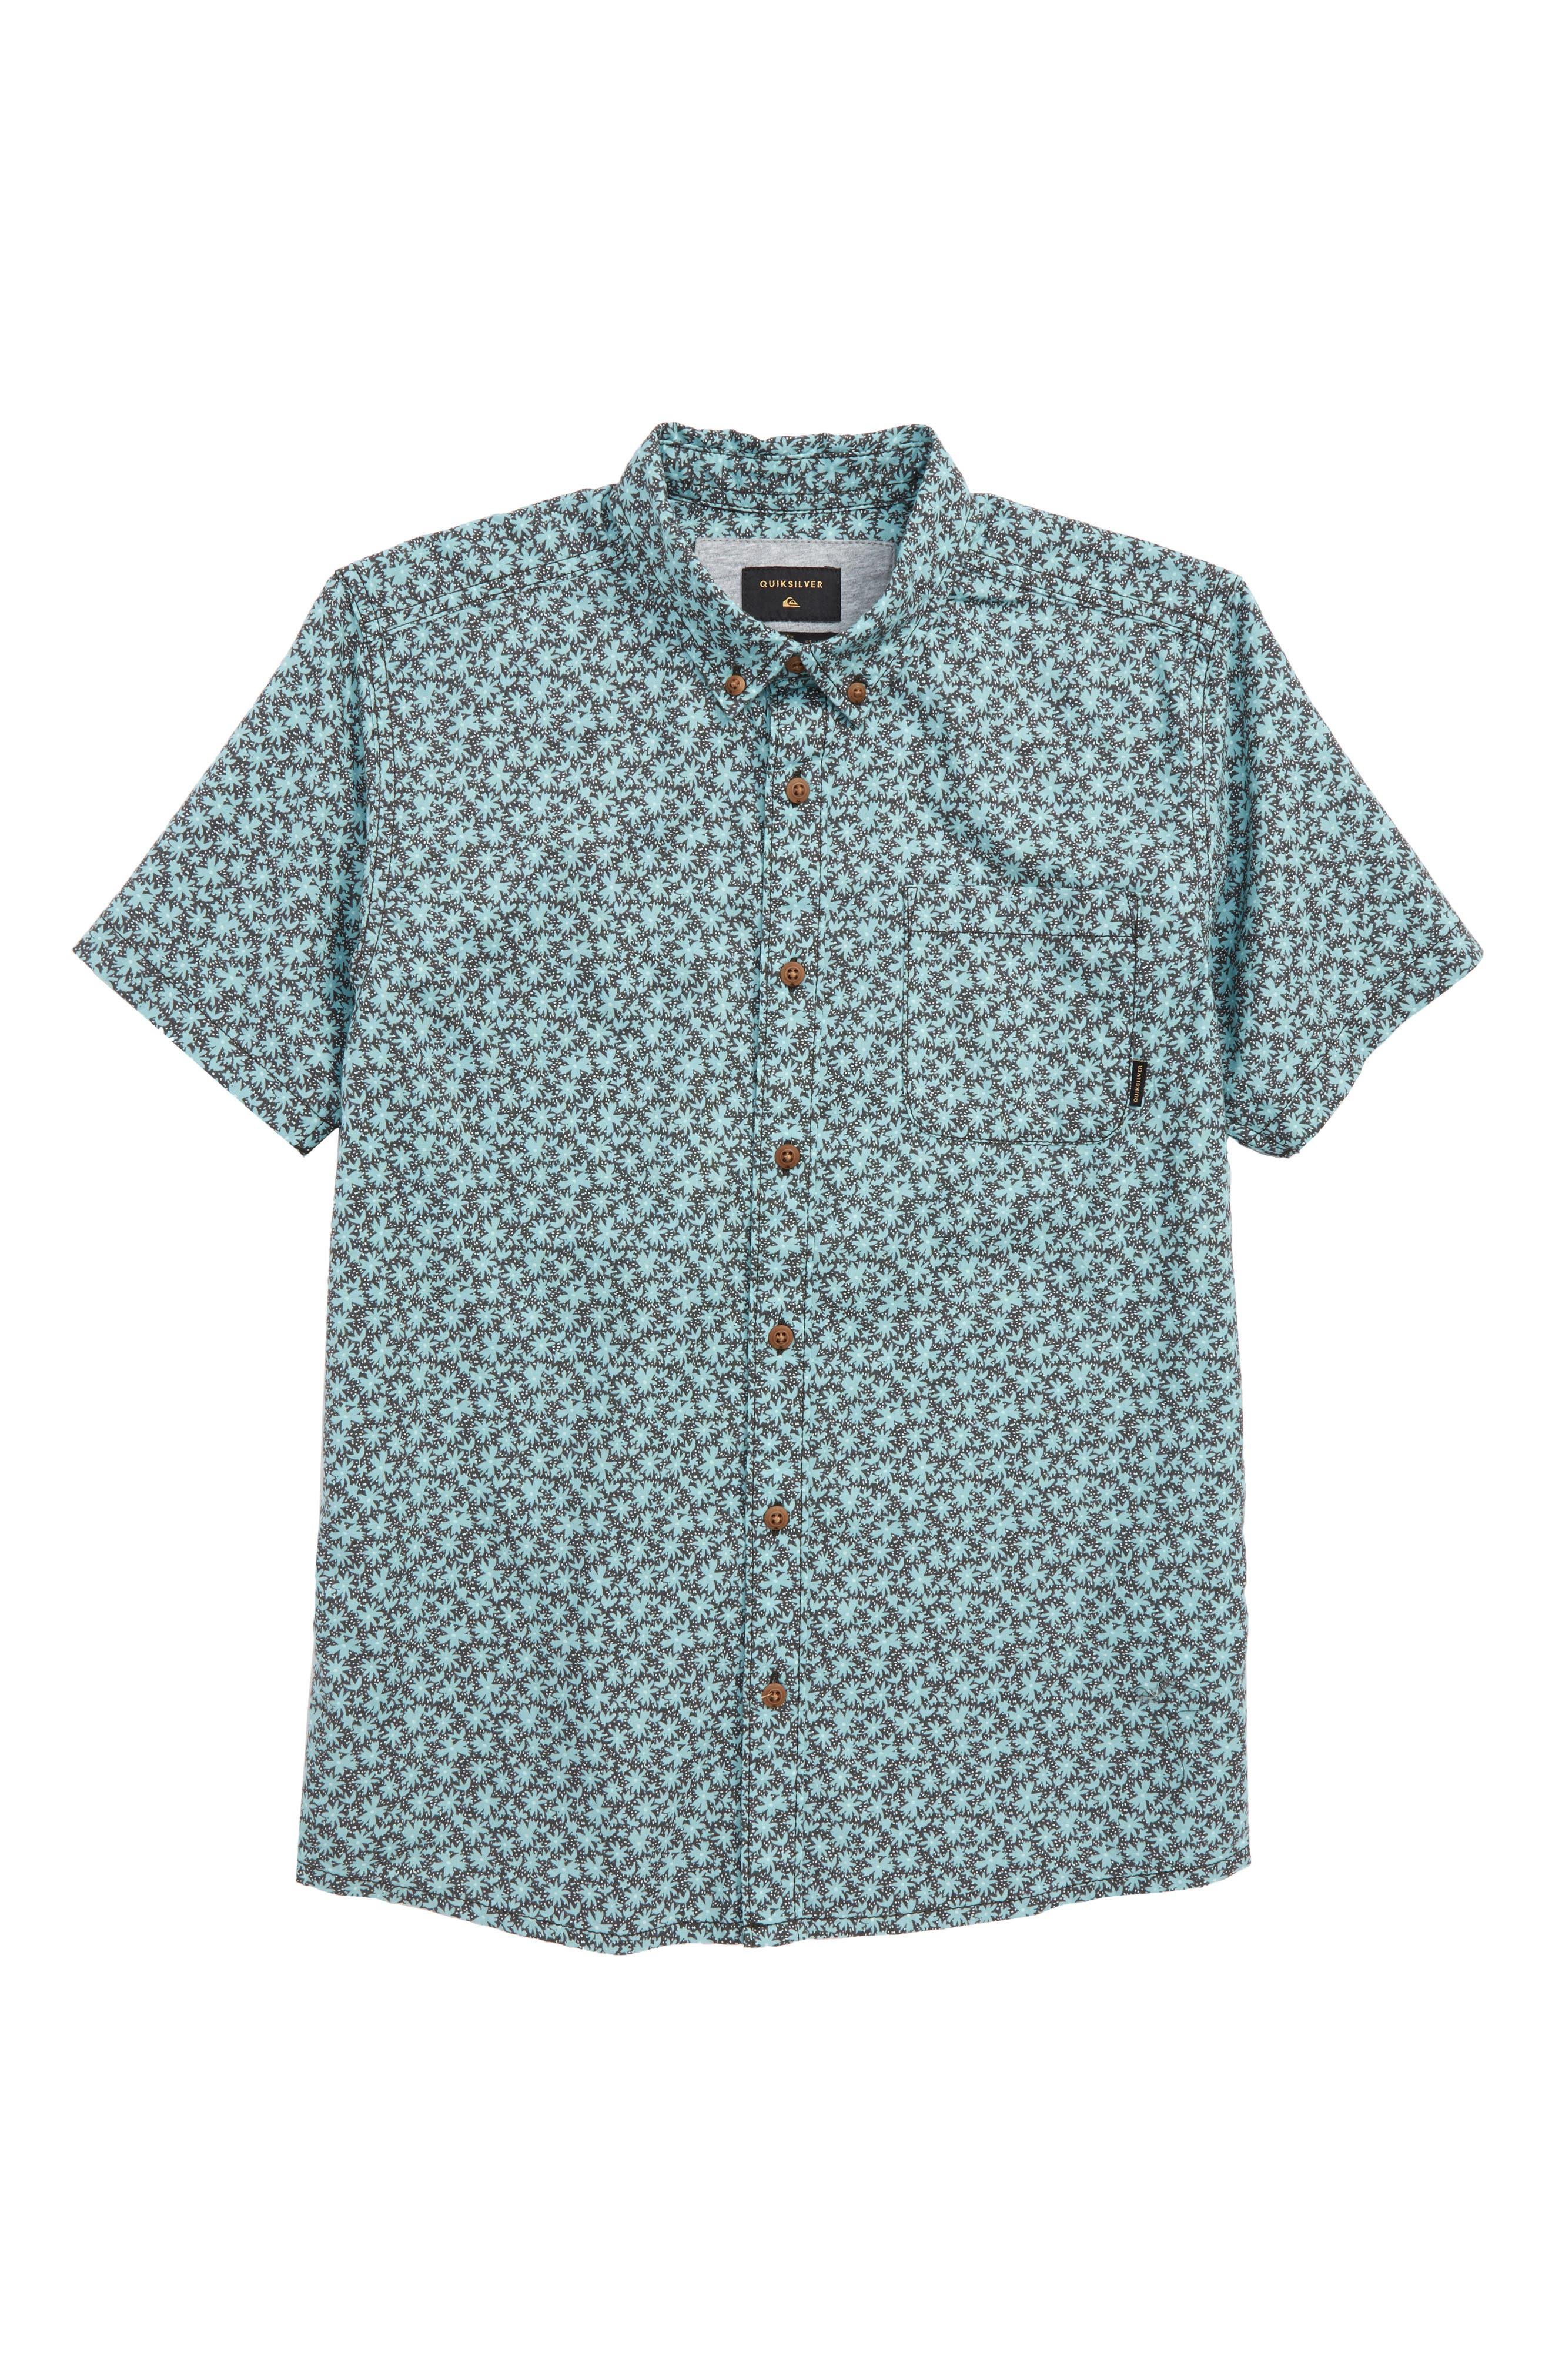 Minikani Woven Shirt,                             Main thumbnail 1, color,                             020